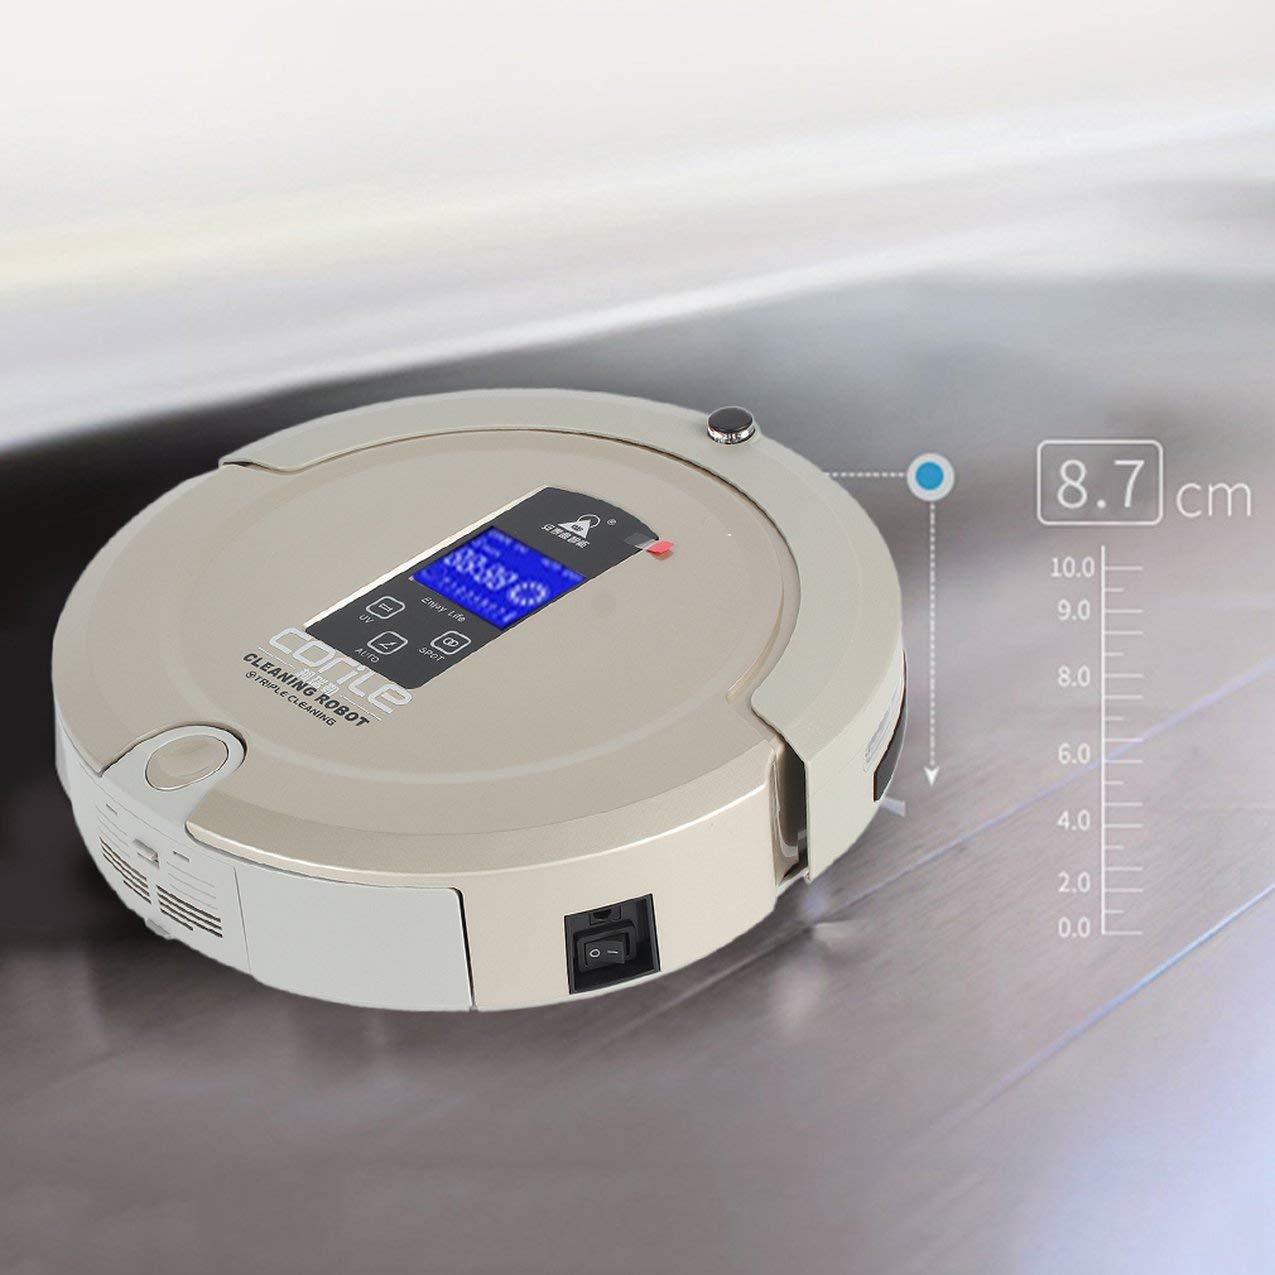 Redstrong CORILE A325S Robot de Limpieza Inteligente Pantalla táctil LCD Anti-caída Aspirador automático Completo con Tanque de Agua: Amazon.es: Juguetes y ...